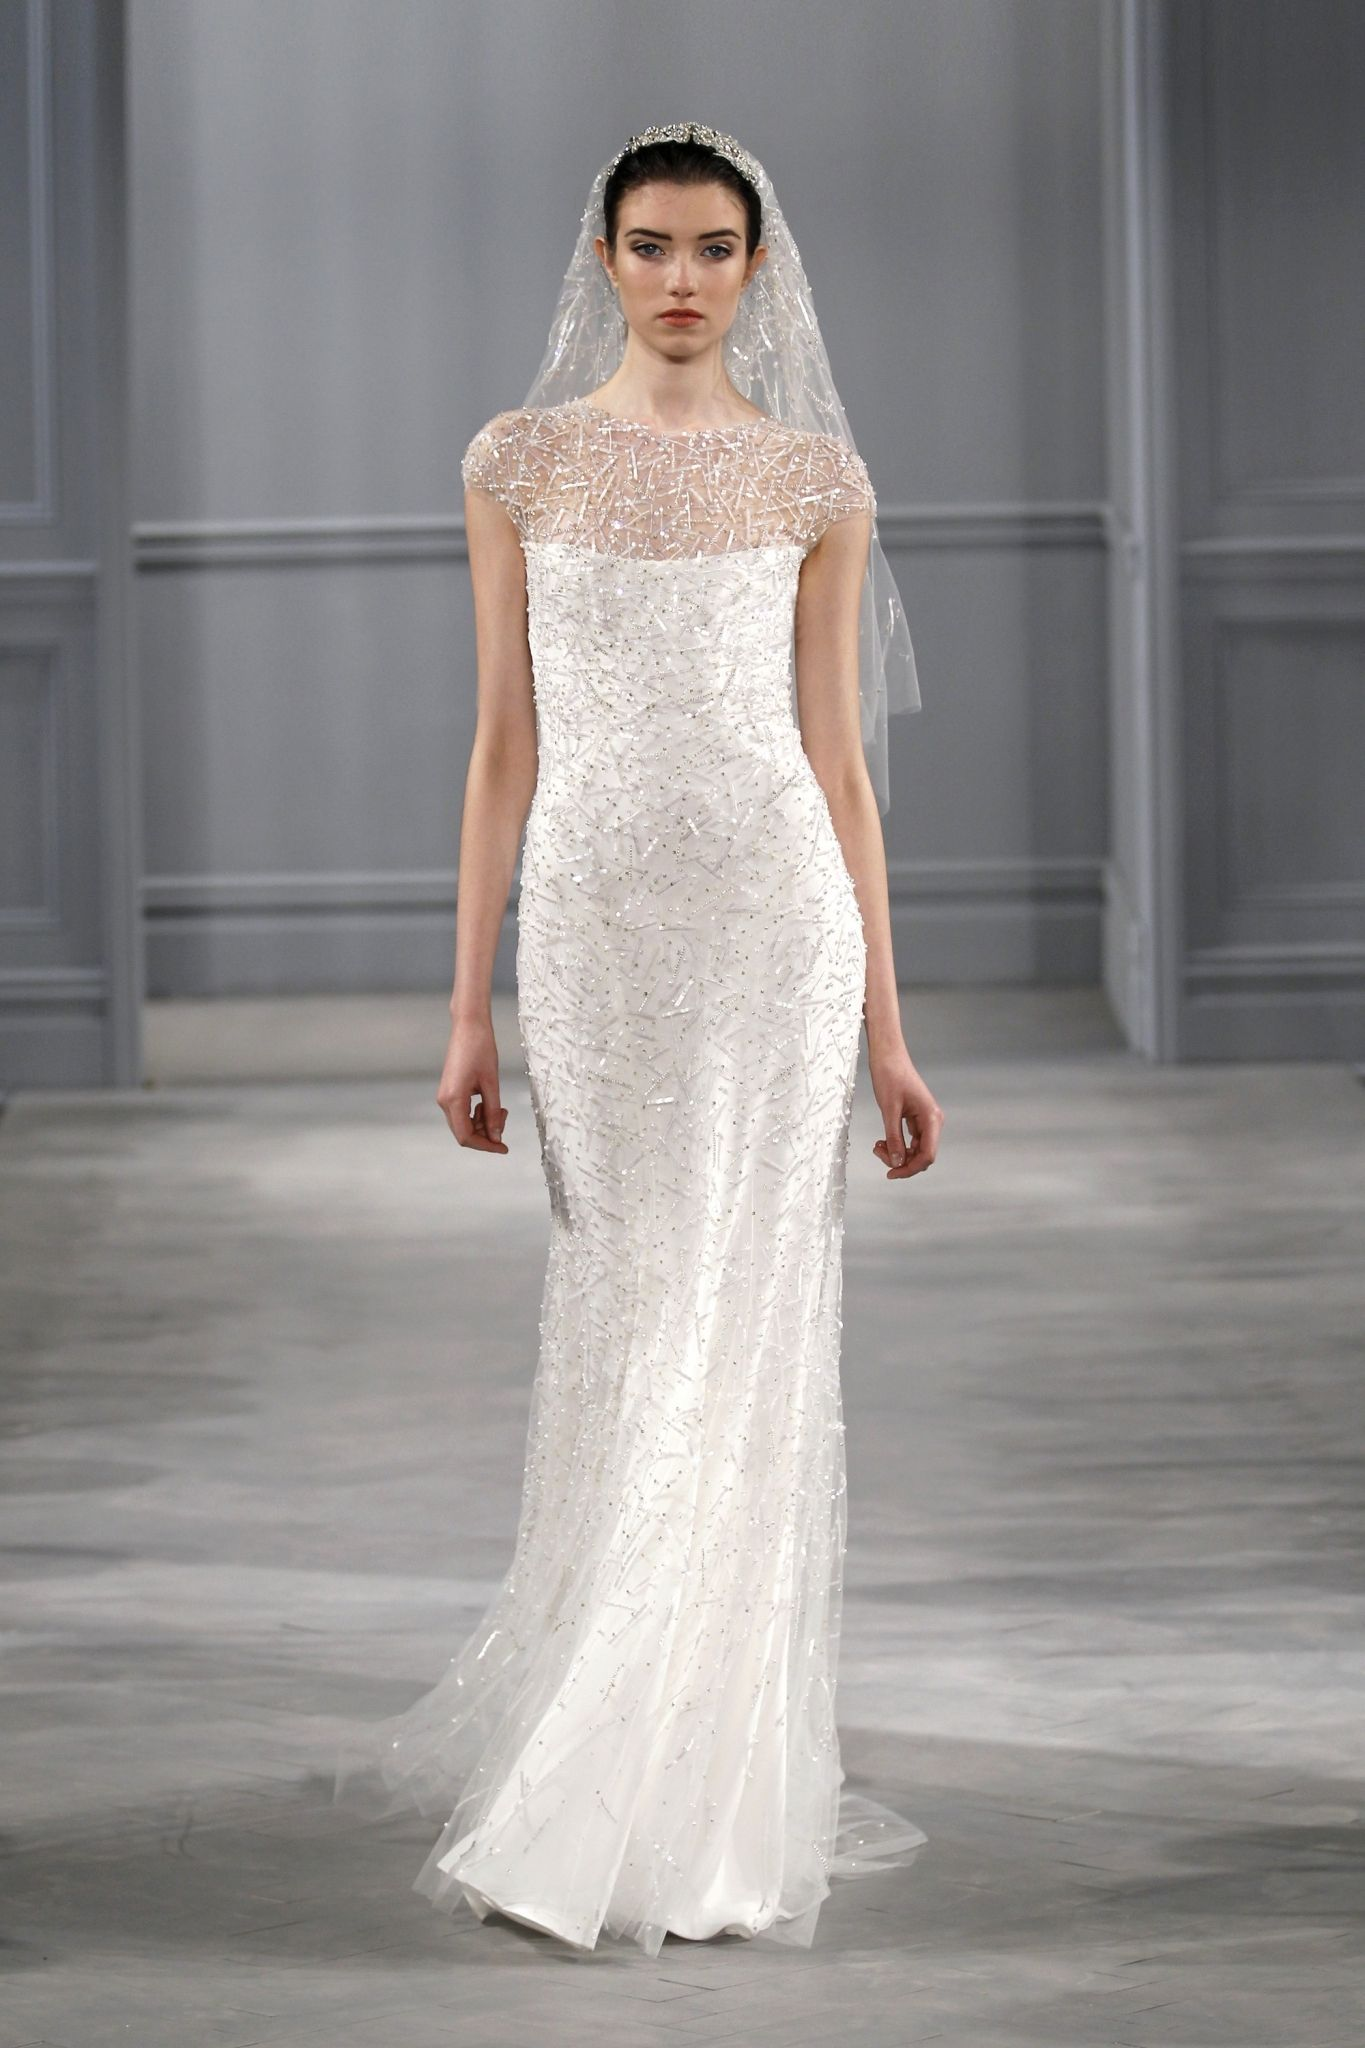 Monique Lhuillier Wedding Dresses Prices Wedding Dresses For The